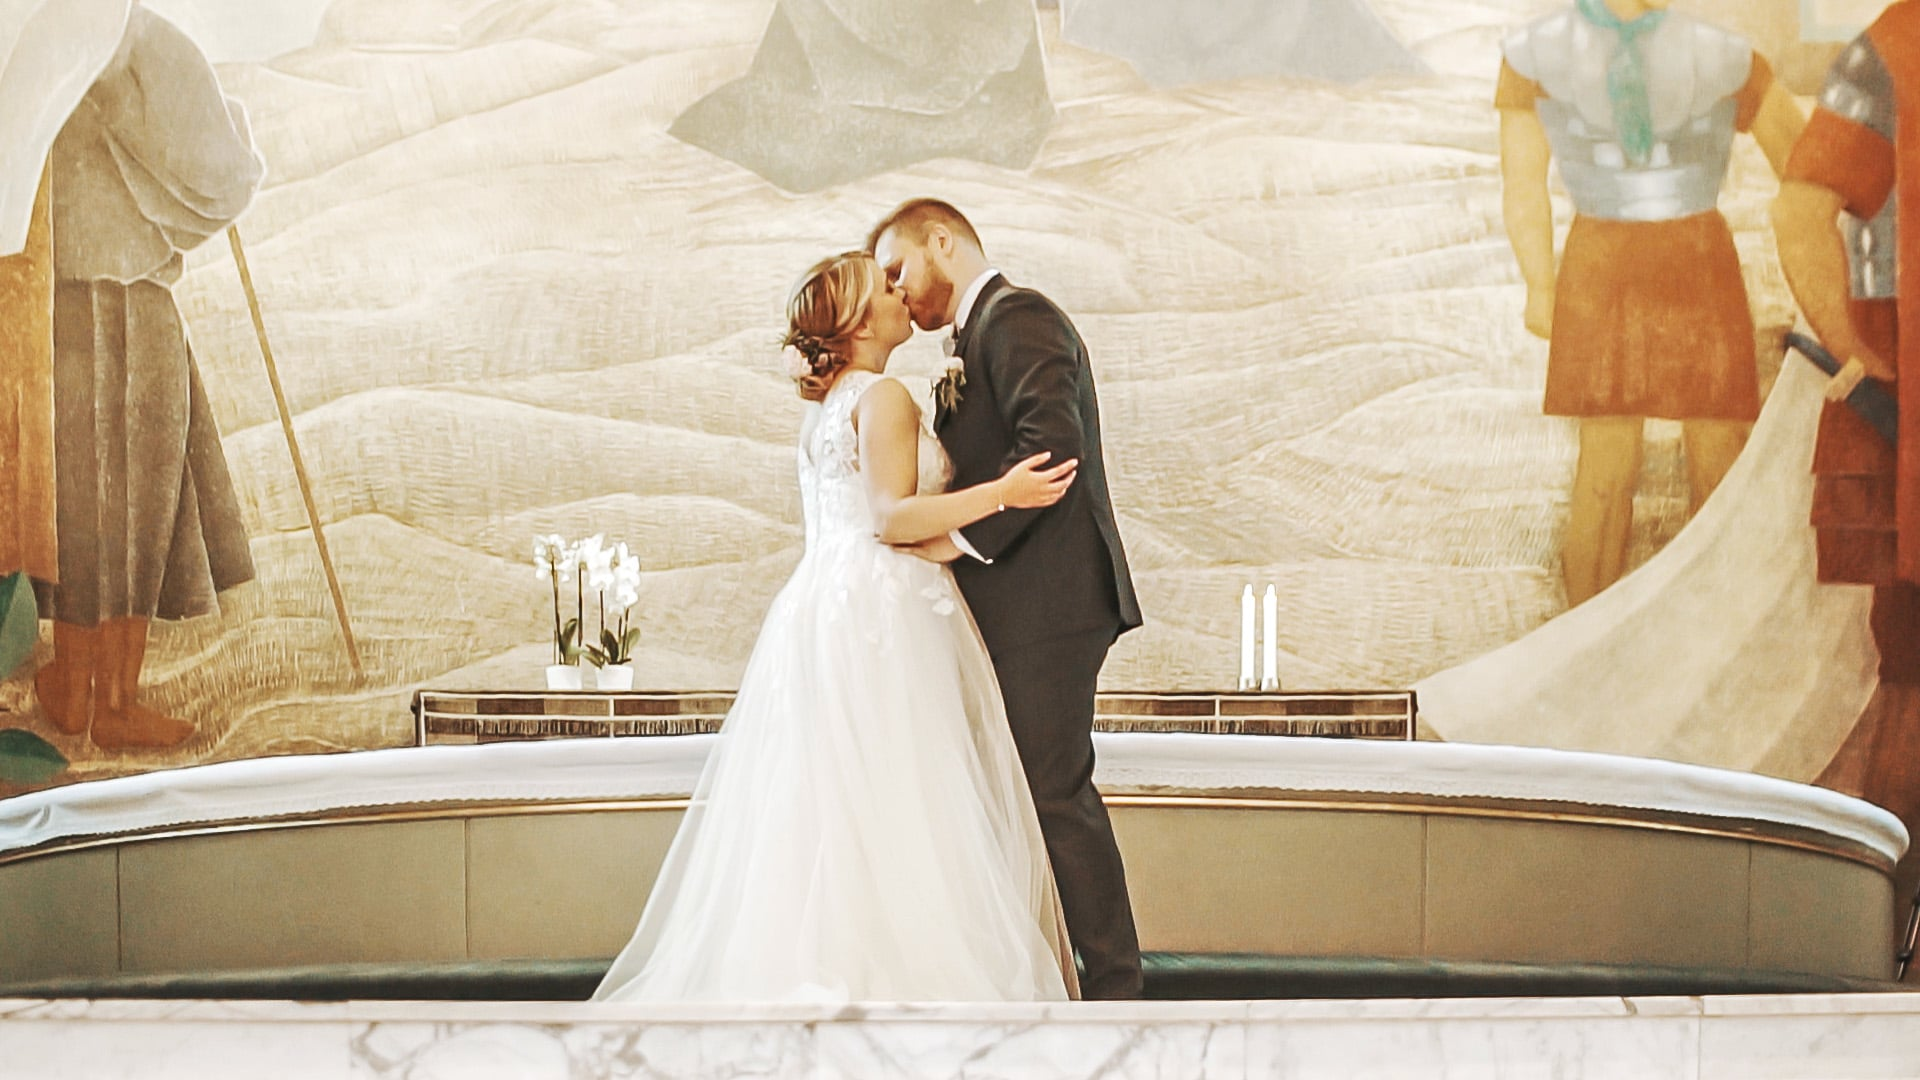 Sanna & Teemu 2020 Wedding Teaser